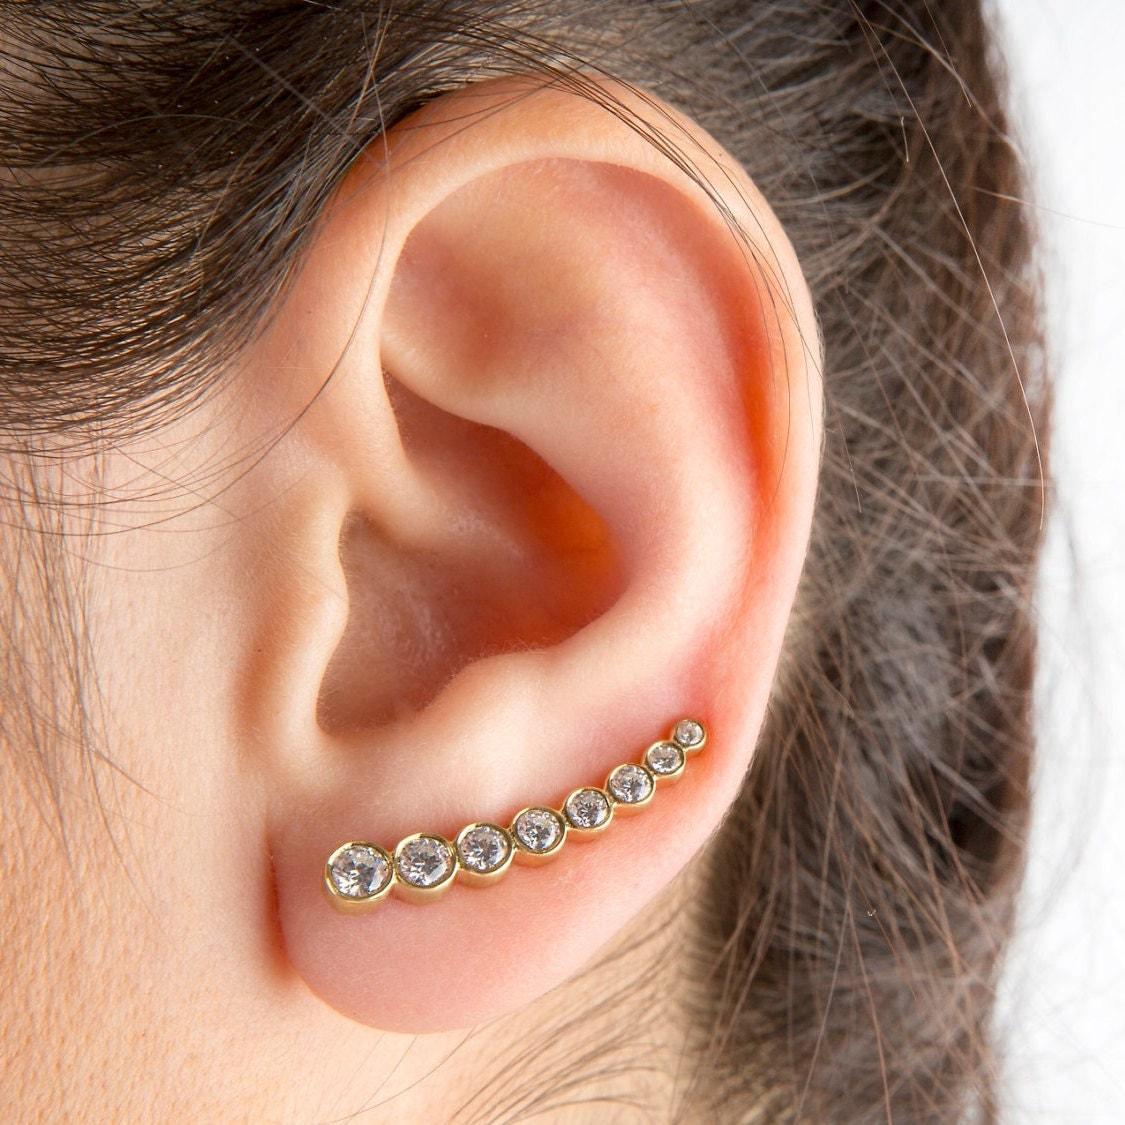 silver ear cuffs sterling silver earrings swarovski wrap. Black Bedroom Furniture Sets. Home Design Ideas